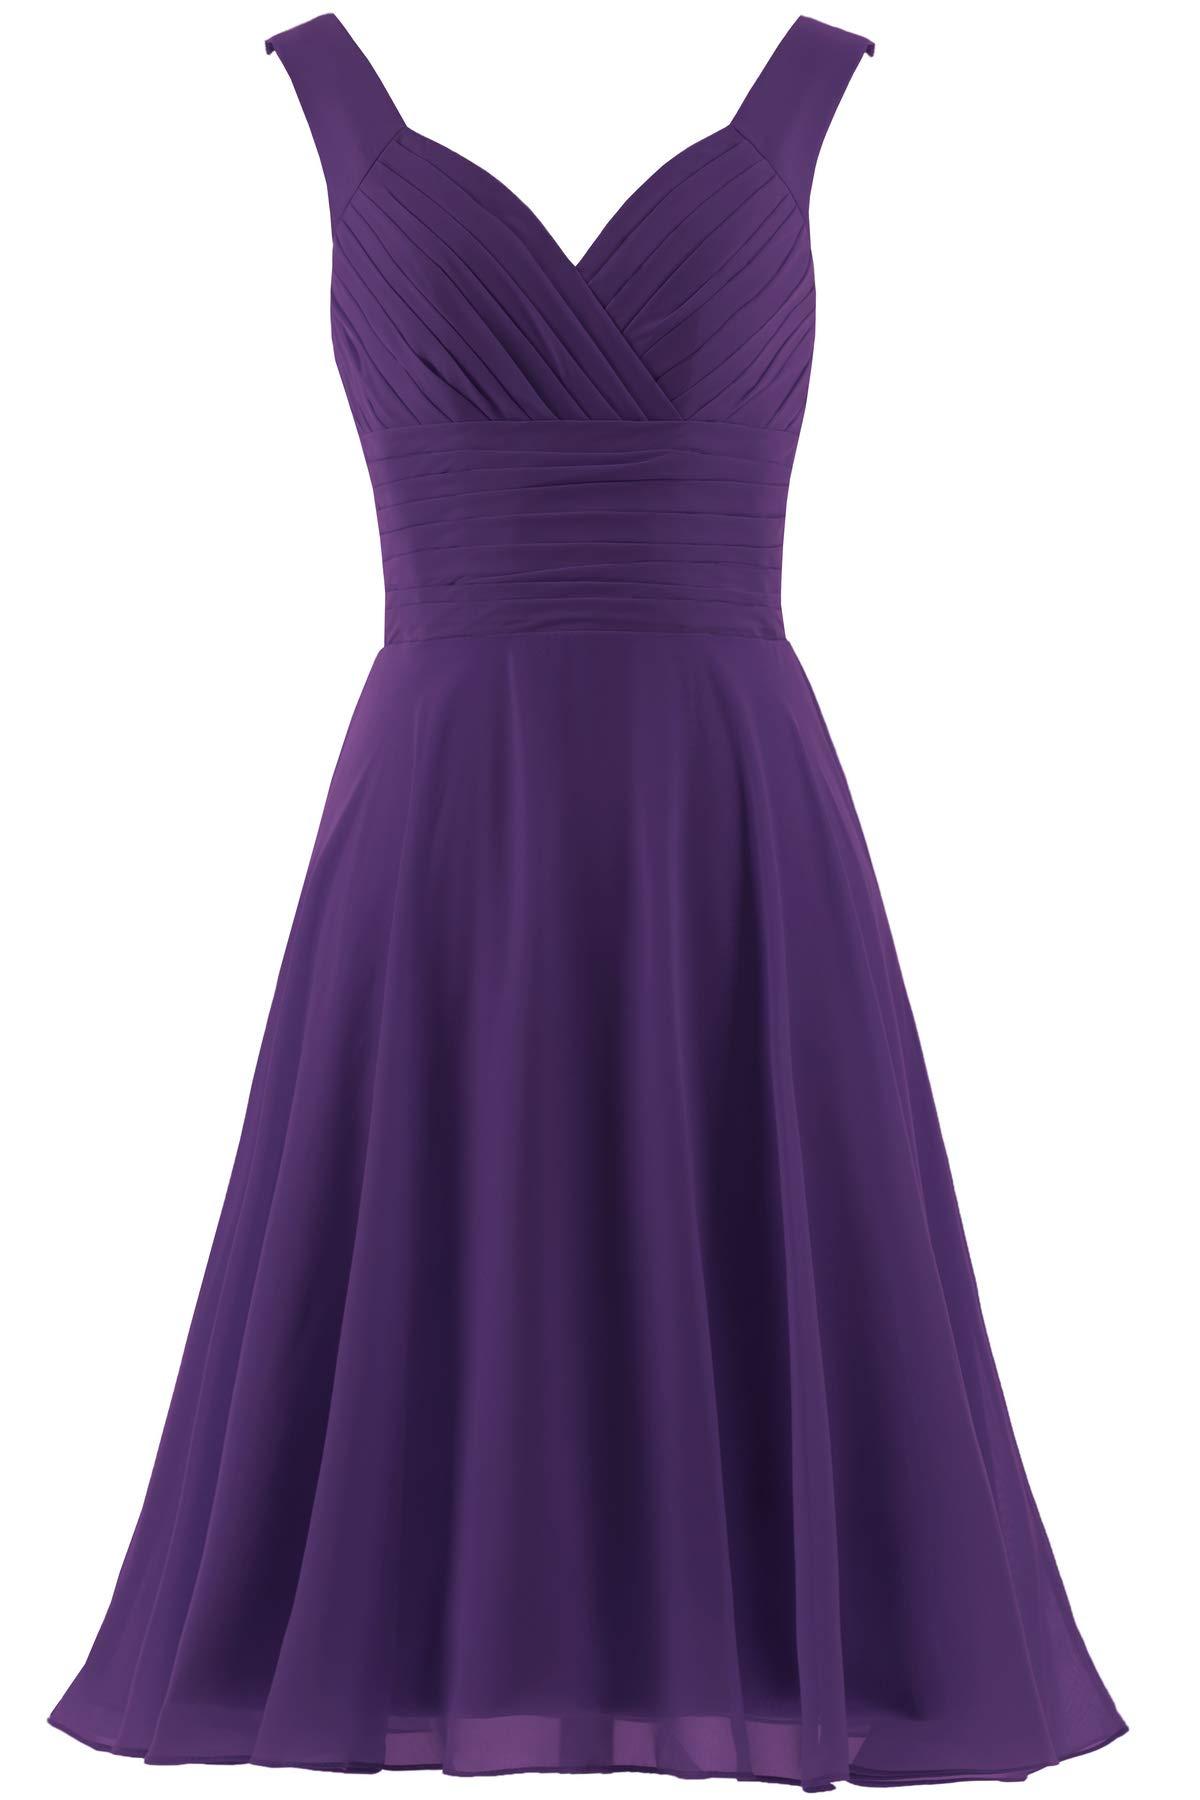 12ced4a04b7 Dark Purple Bridesmaid Dresses Short - Data Dynamic AG